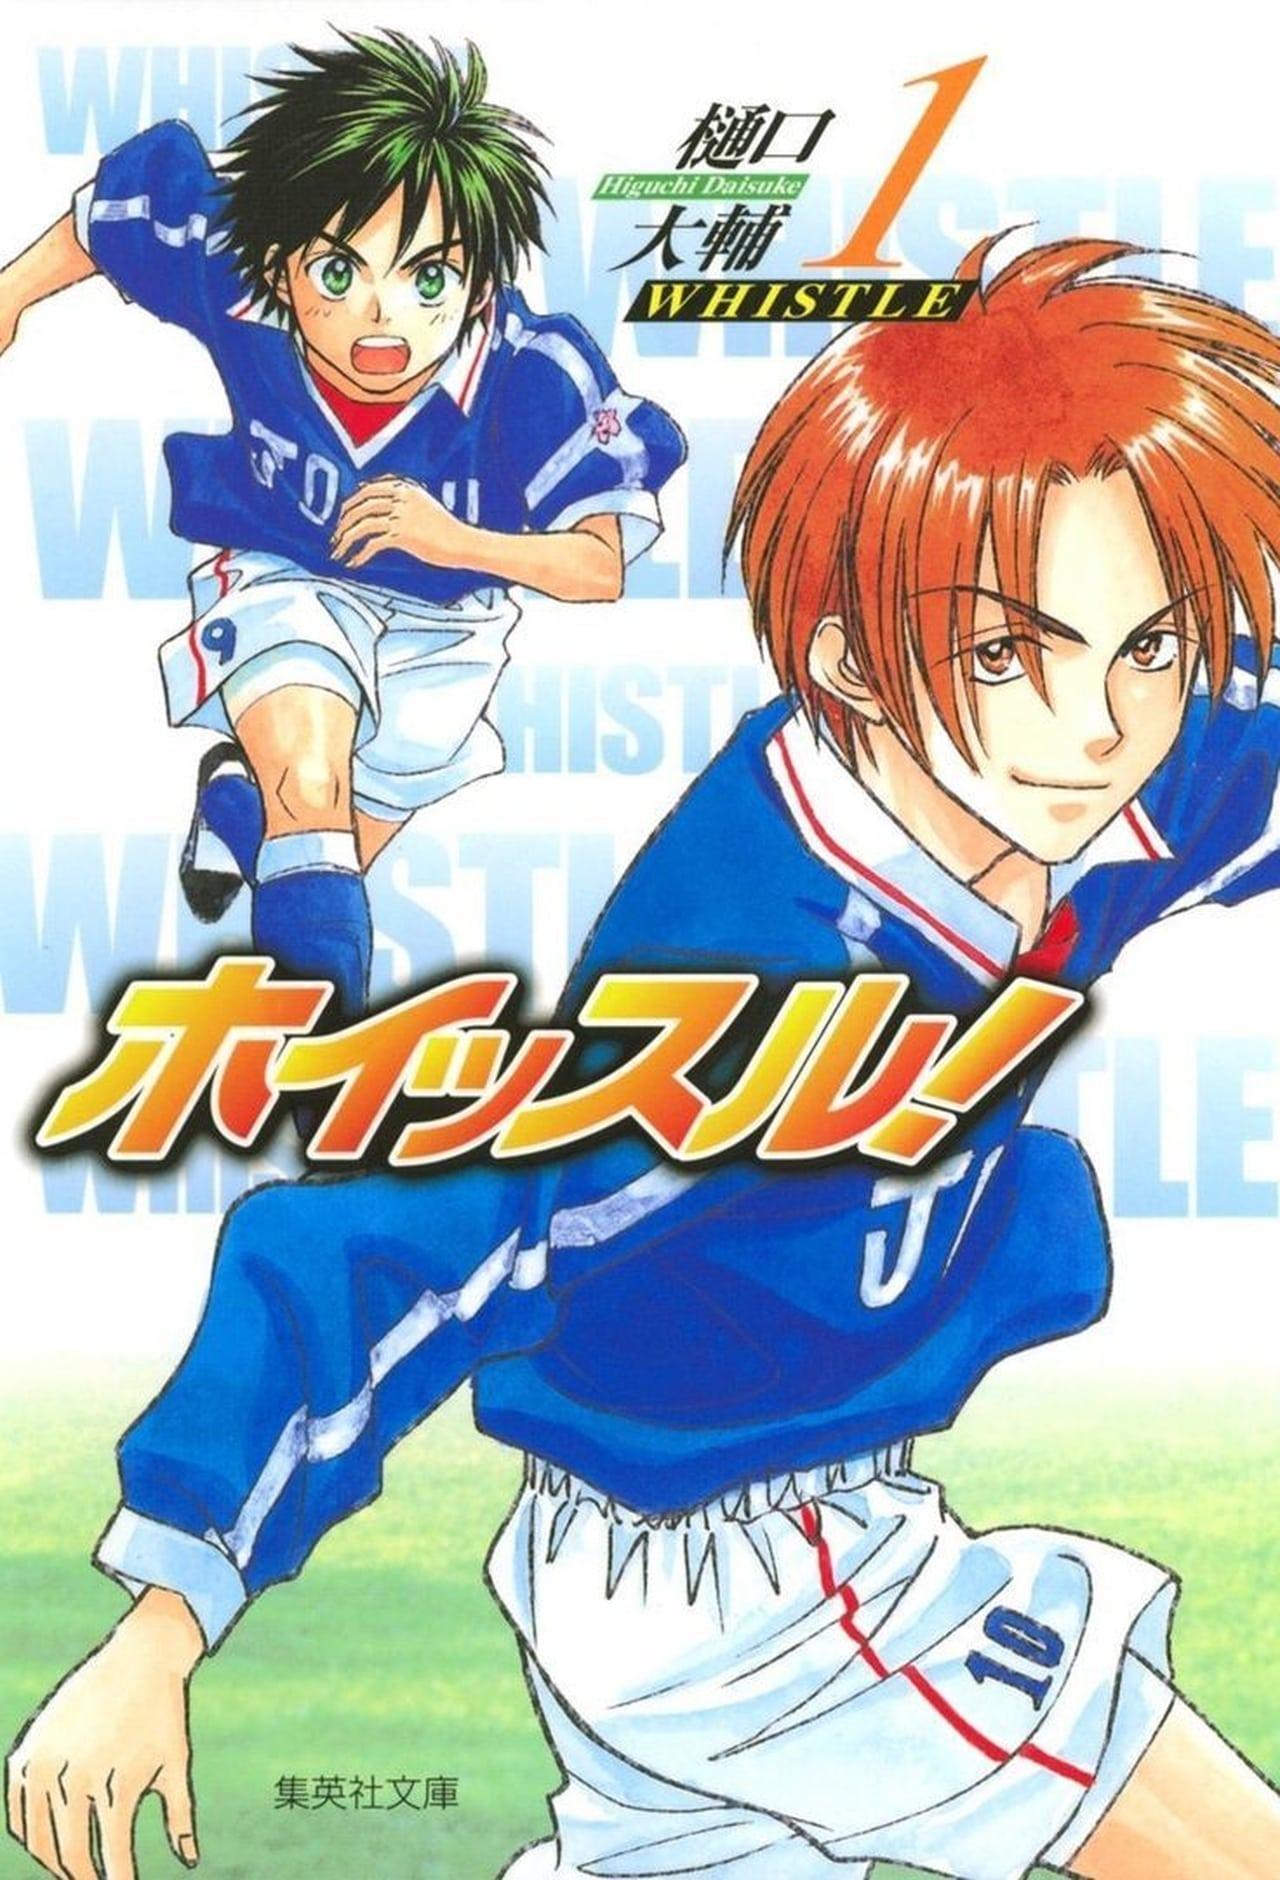 Whistle! (2002)